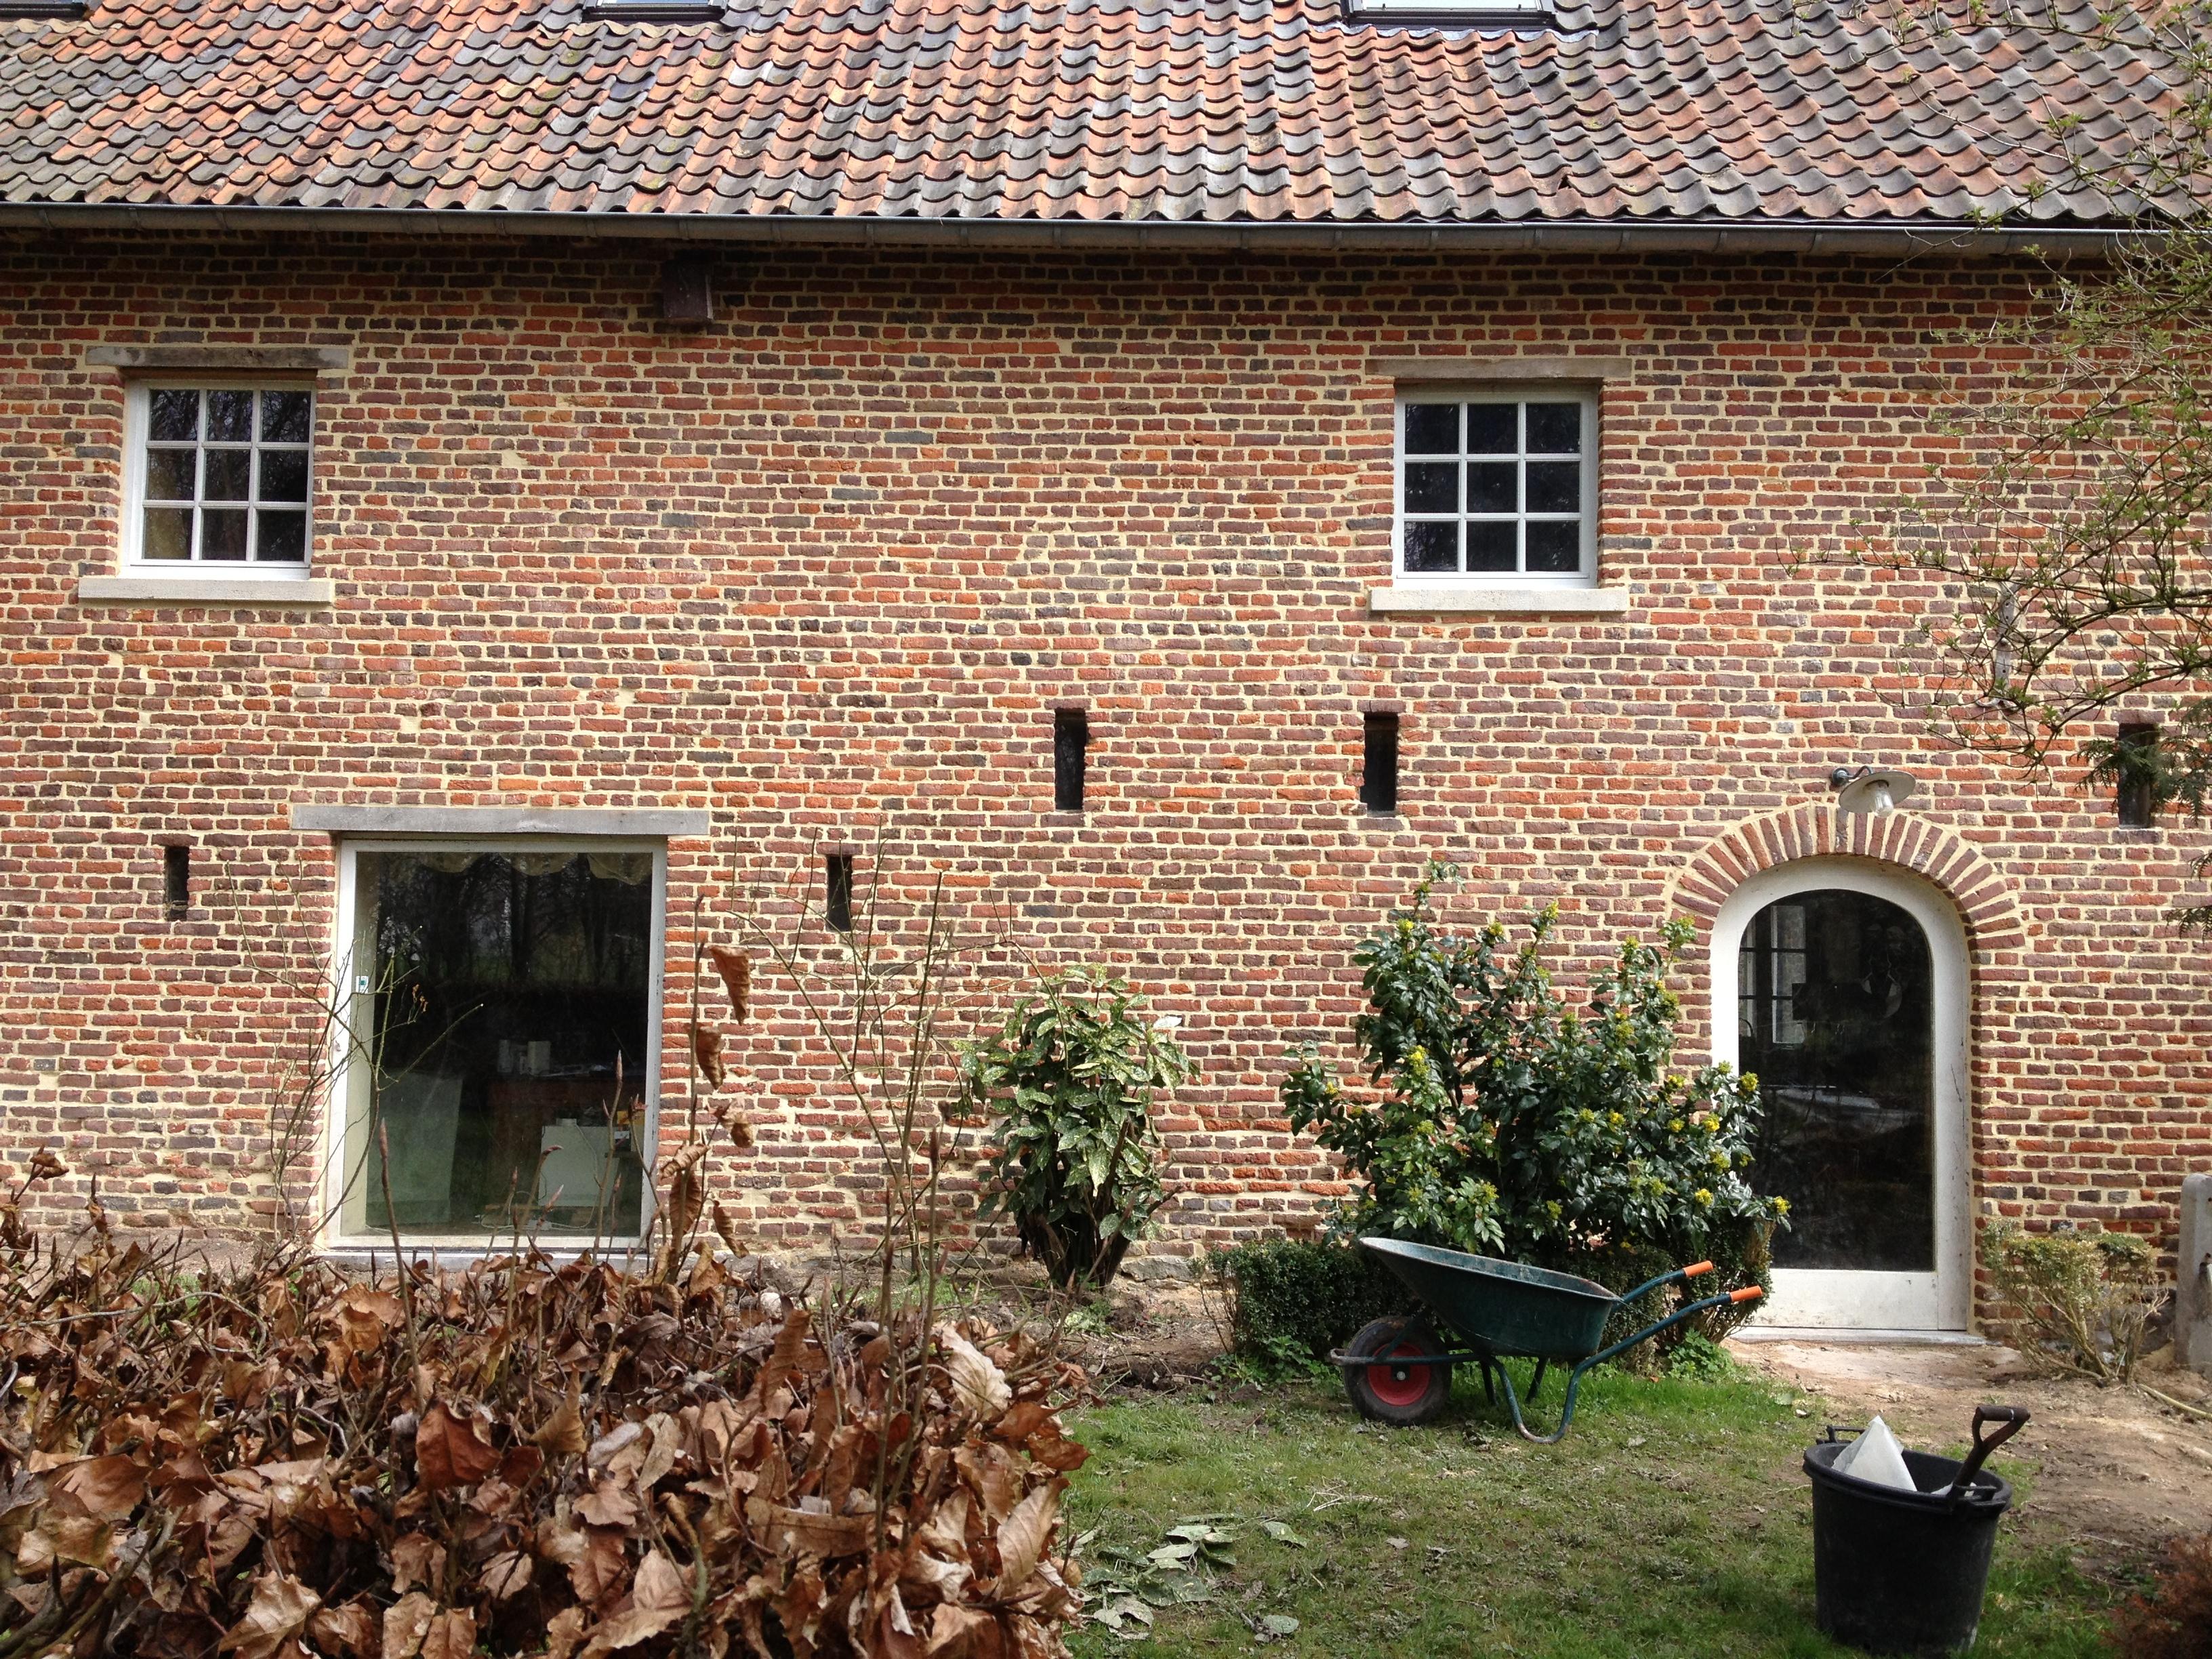 Hoeve restauratie gevelwerken loyen - Oude huis gevel ...